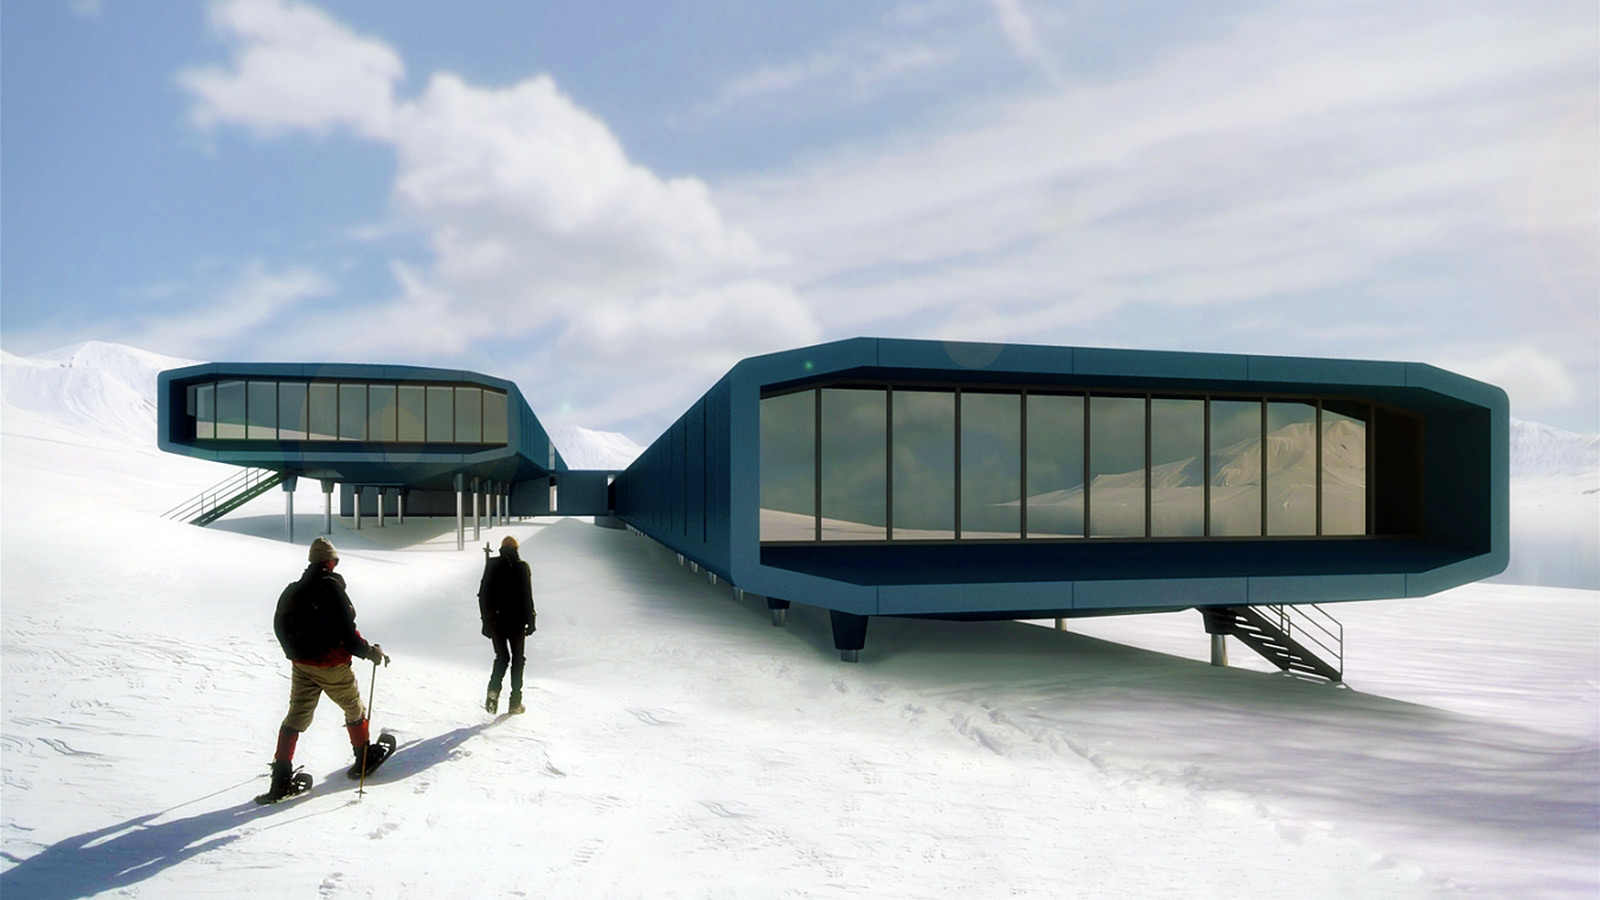 estudio-41-estacao-antarctica-ferraz-brazil-antarctic-research-station-elevation-view